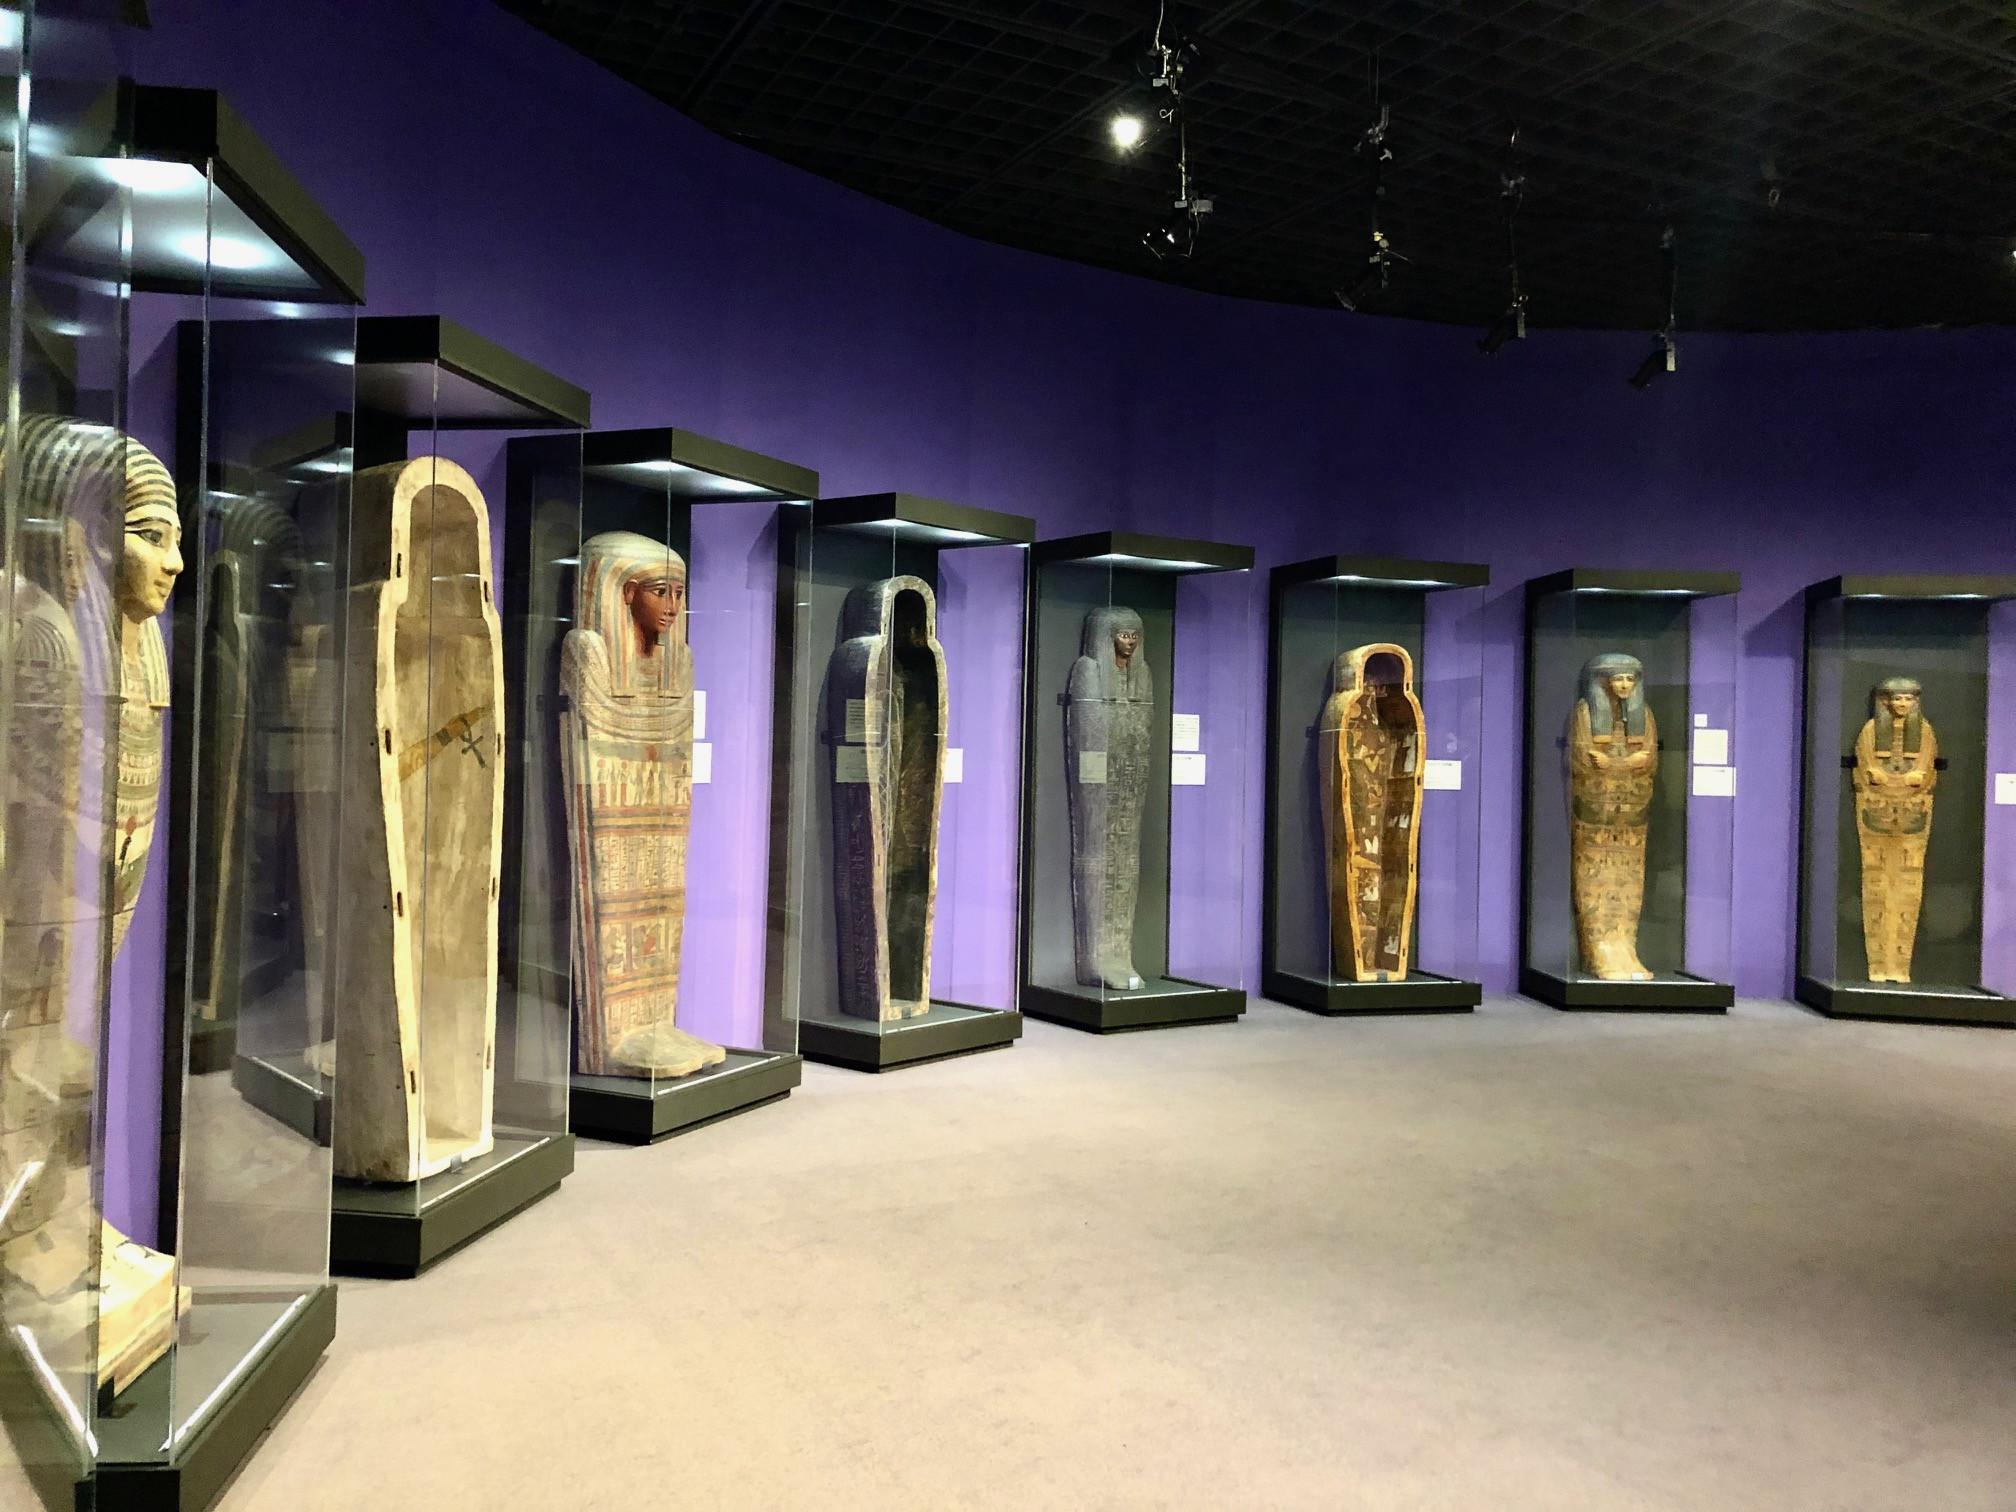 Bunkamura ザ・ミュージアム「ライデン国立古代博物館所蔵 古代エジプト展」展会場